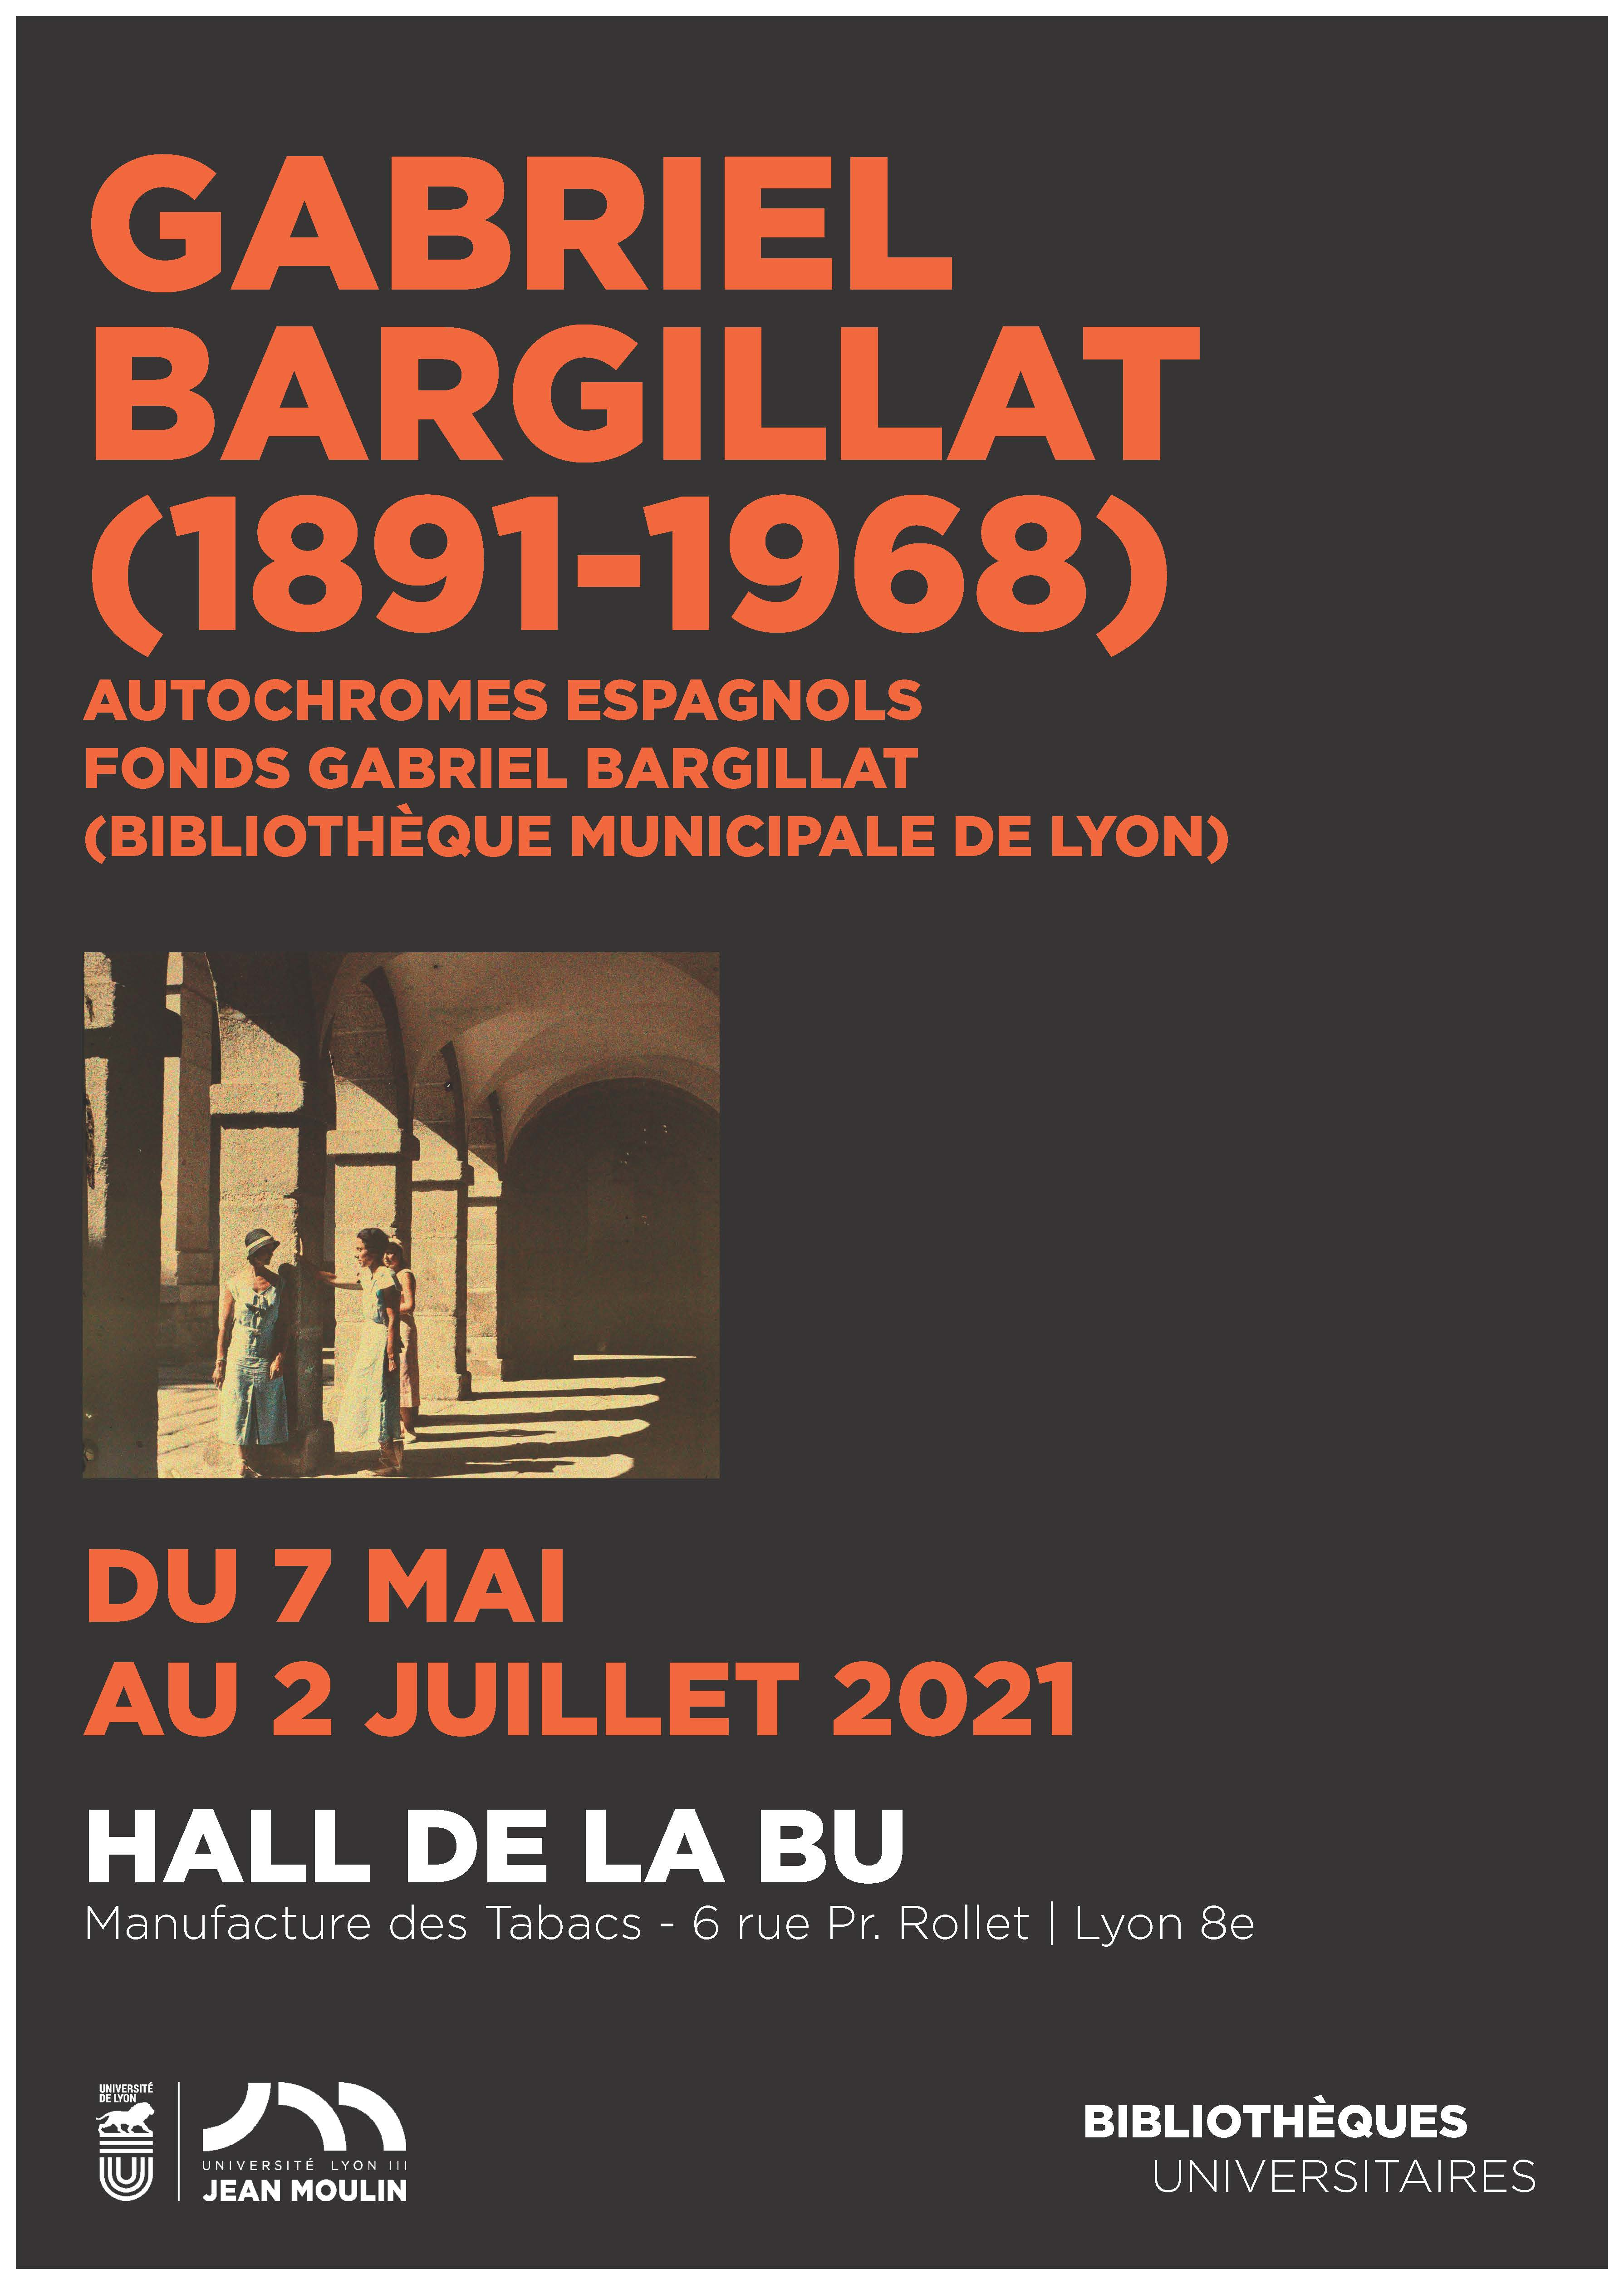 Gabriel Bargillat (1891-1968), Autochromes espagnols